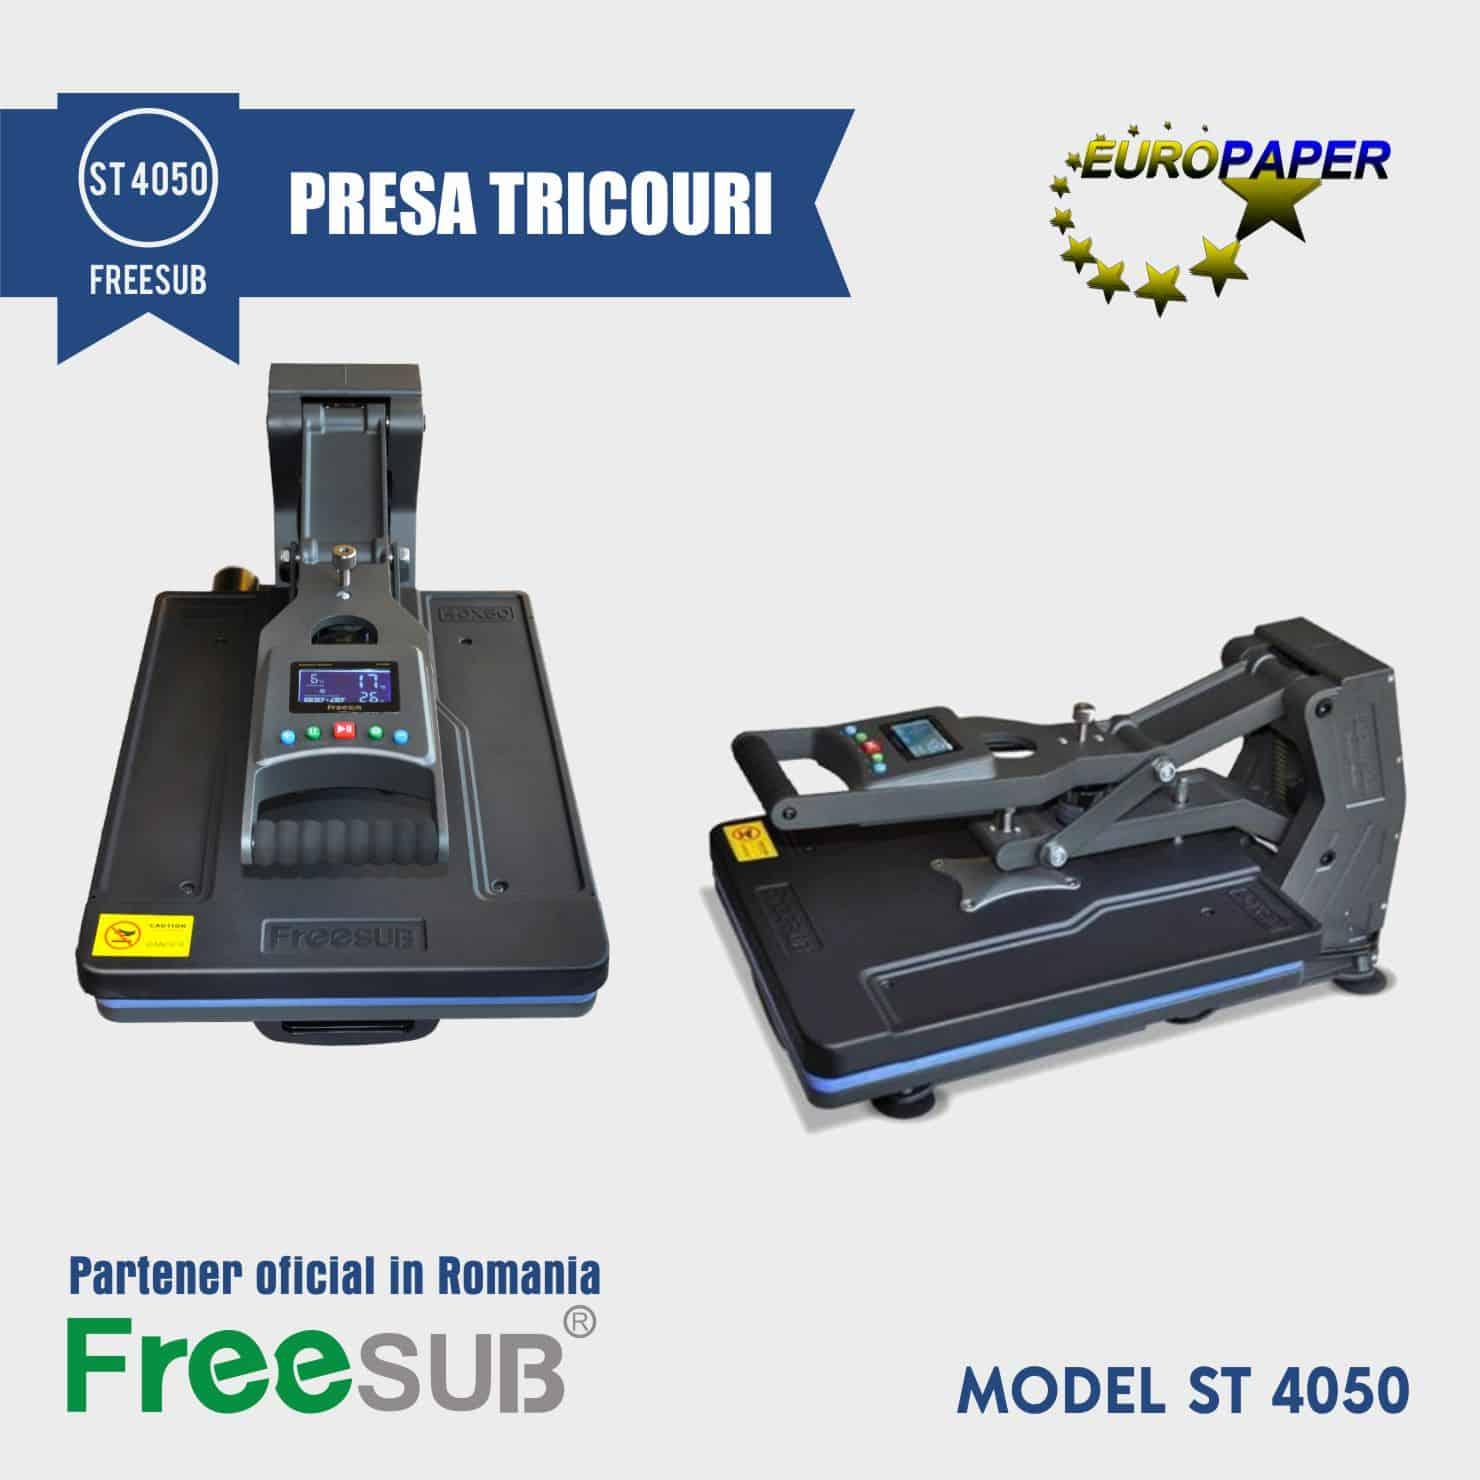 st 4050 freesub